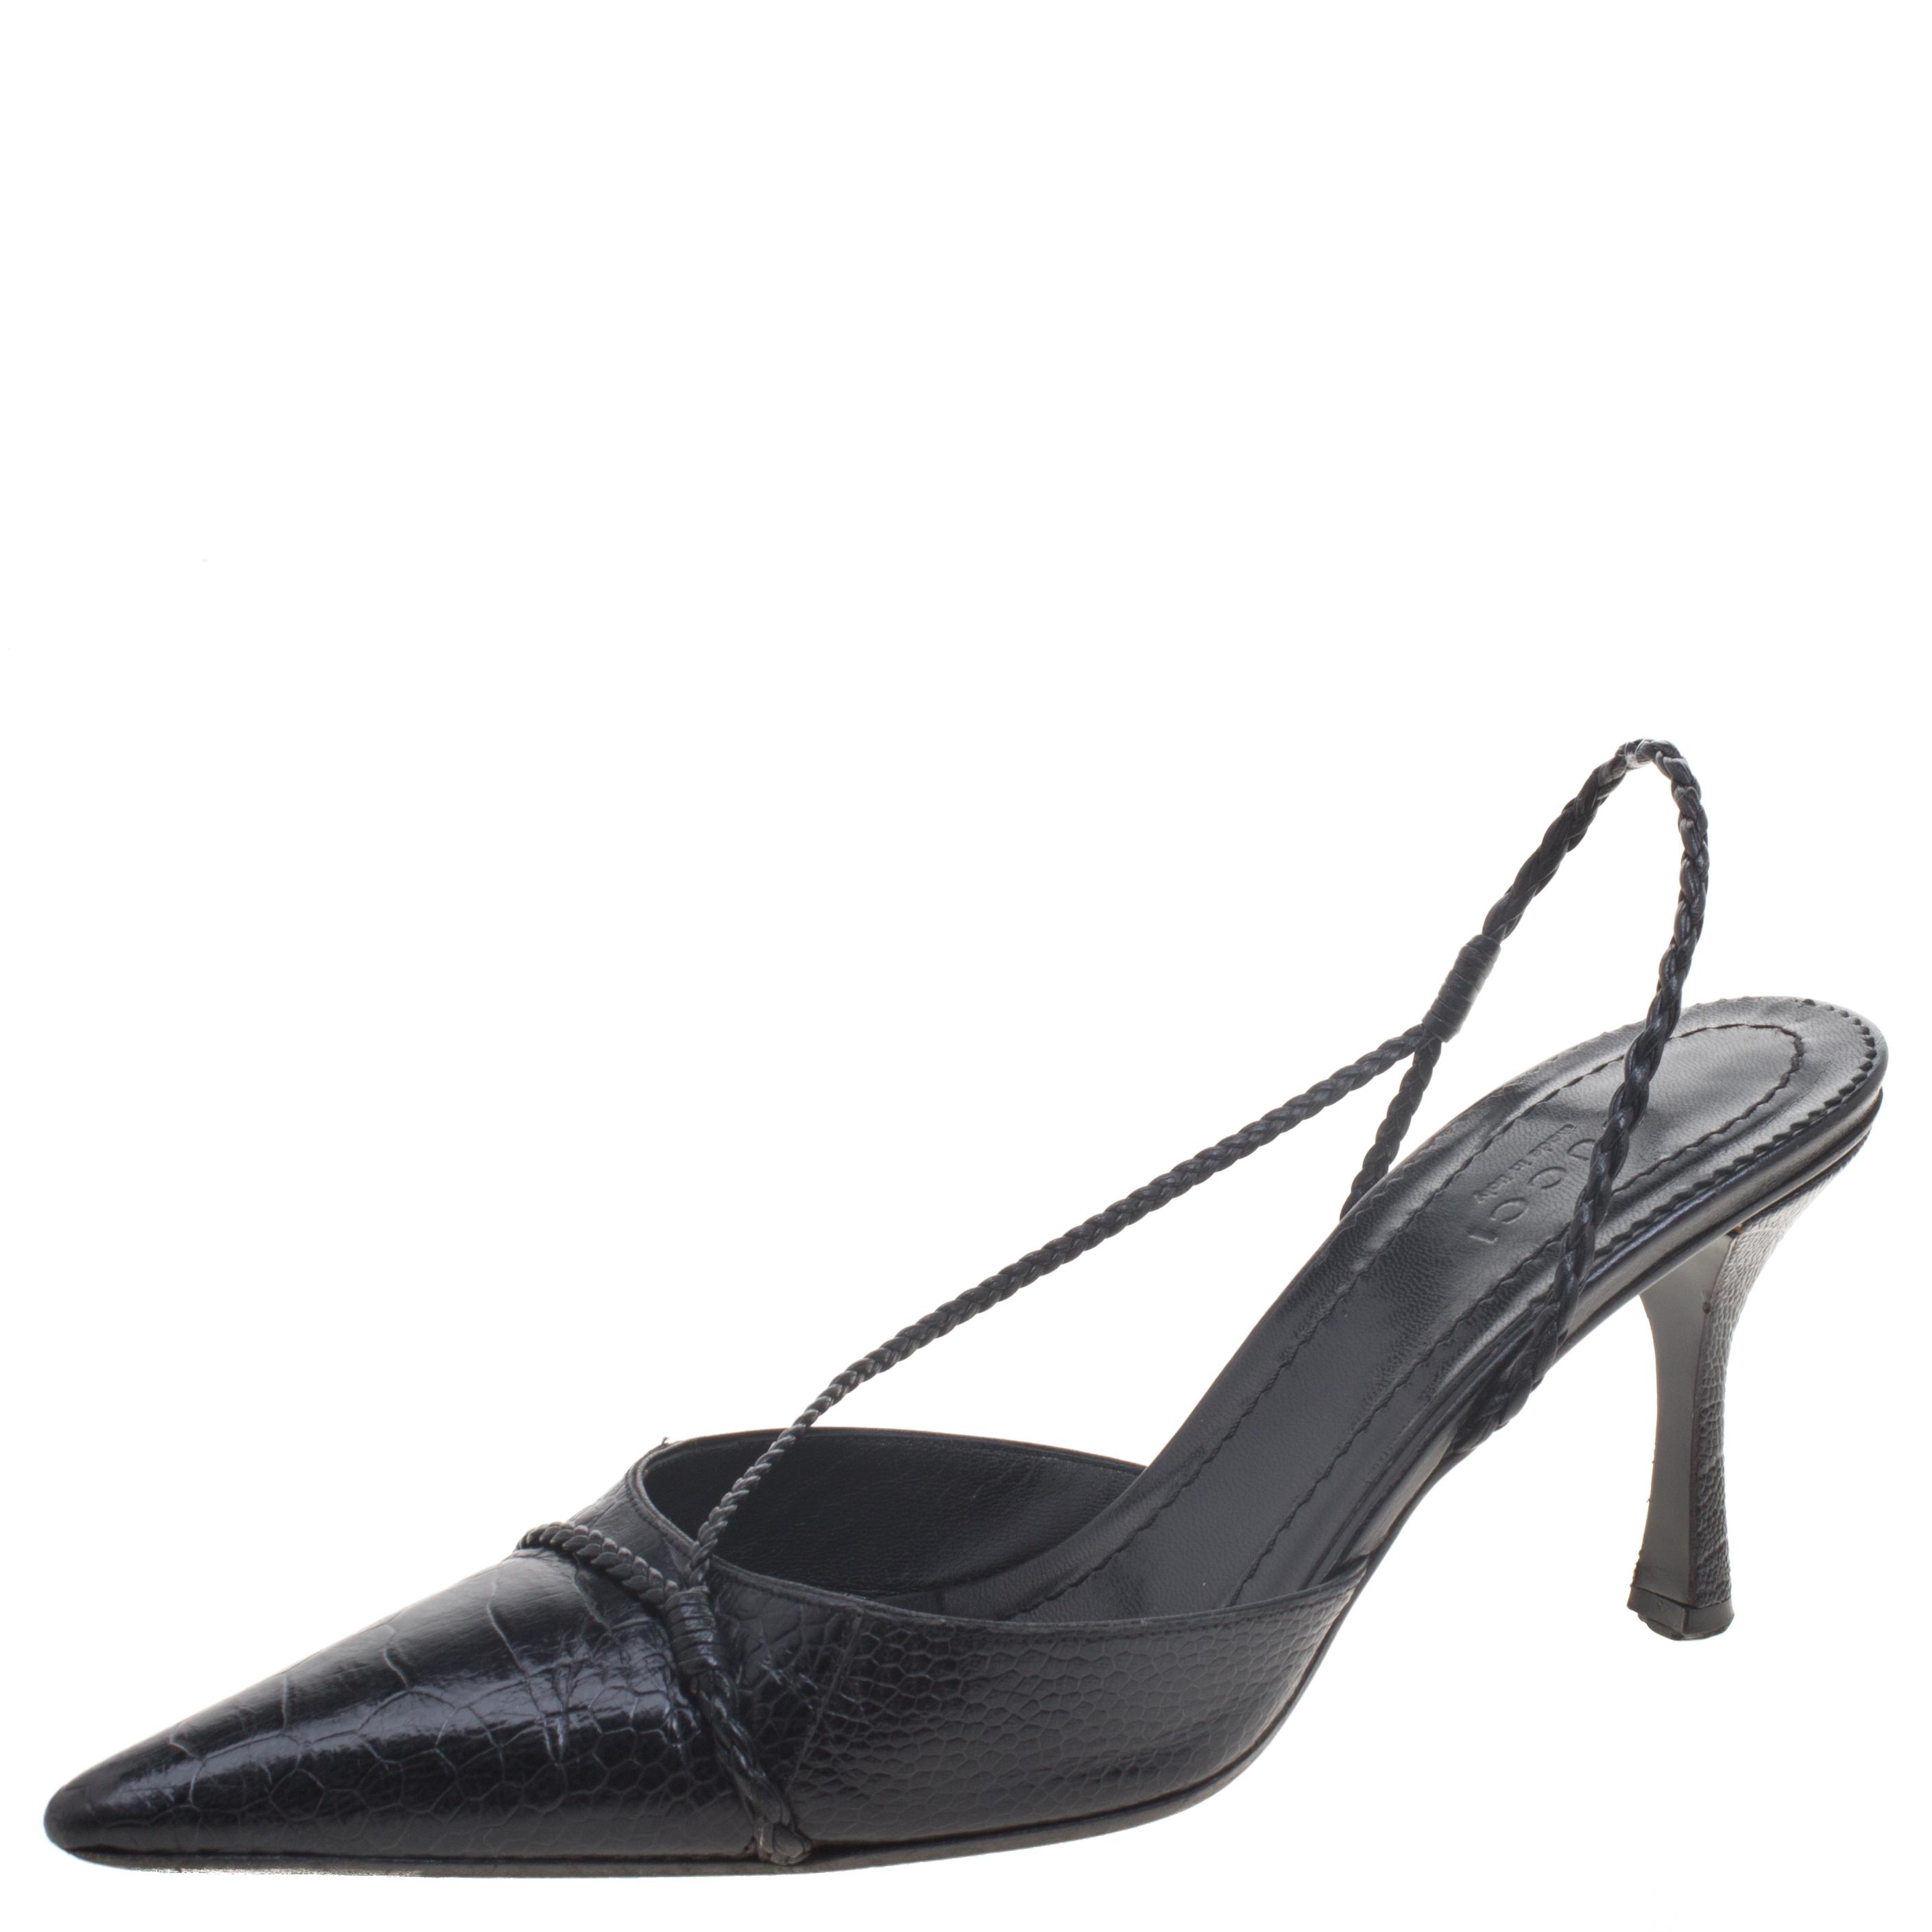 8c5e712e8 Buy Gucci Black Snake Embossed Leather Braided Slingback Sandals ...